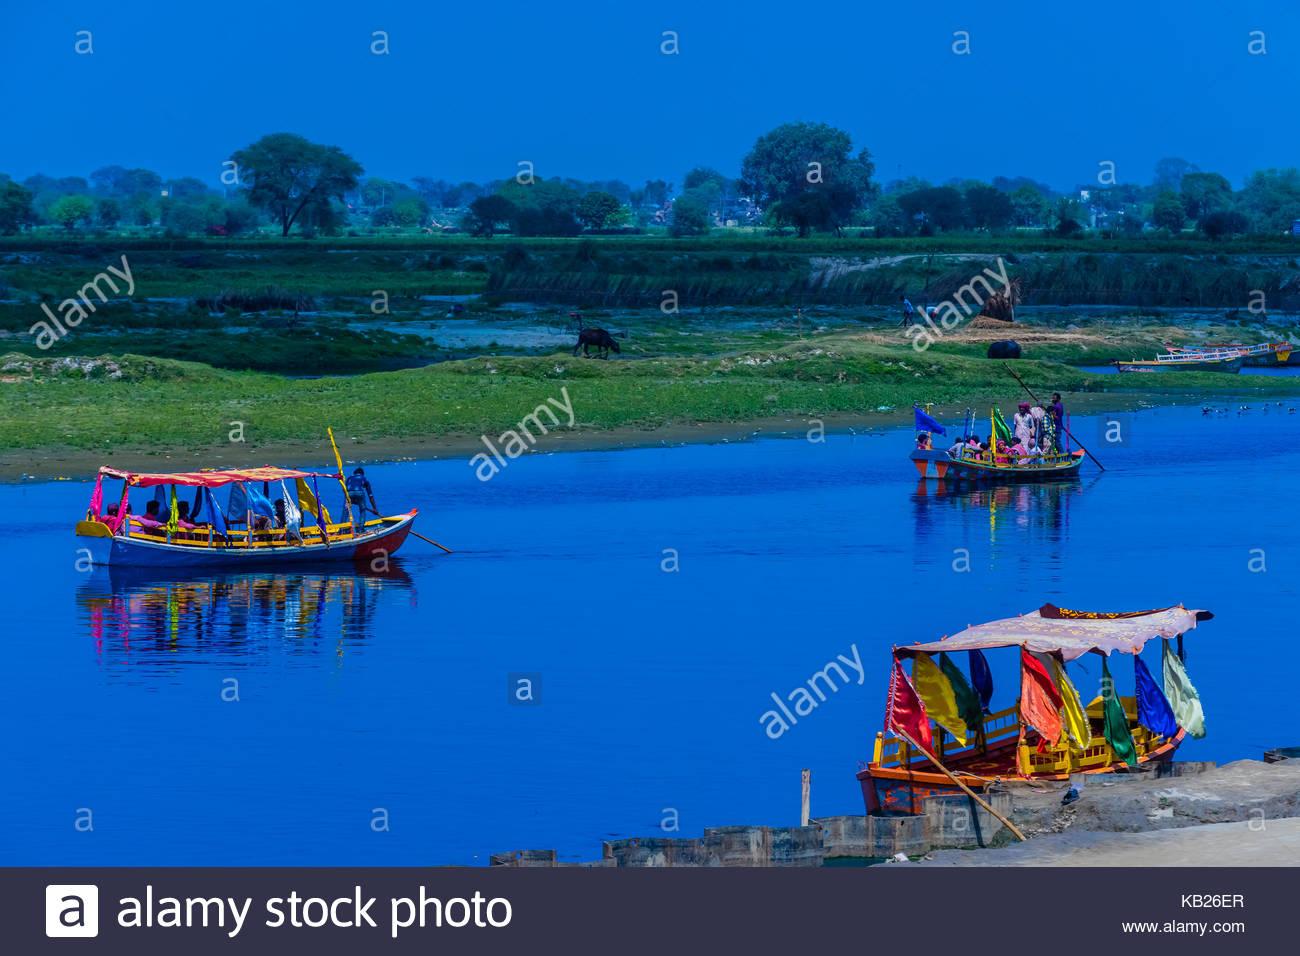 Ferry boats crossing the Yamuna River at Gotam Nagar, Vrindavan, Uttar Pradesh, India. - Stock Image